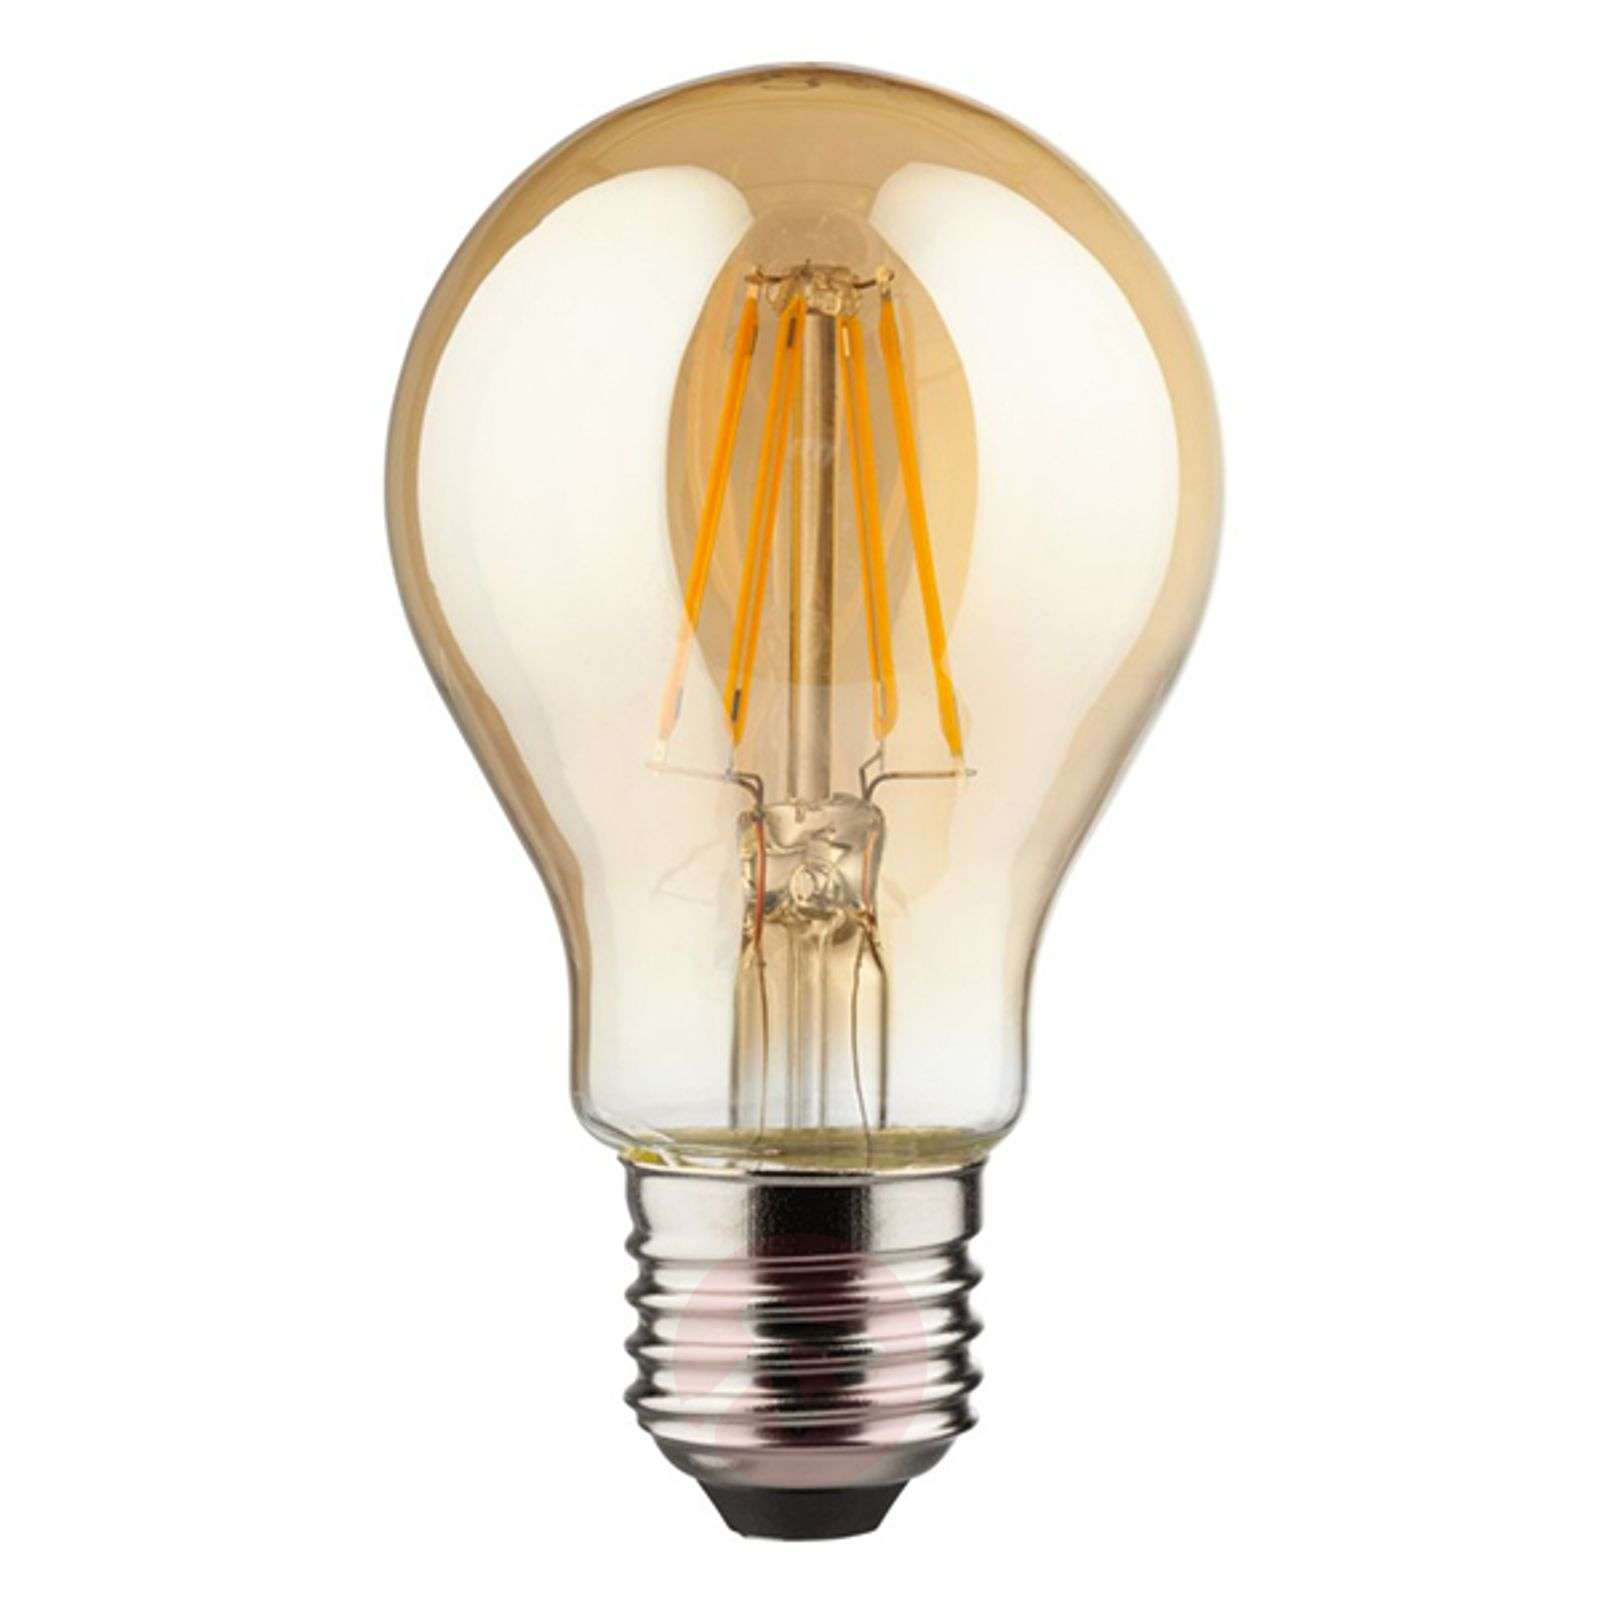 E27 4 W 820 LED filament bulb, gold-6520233-01